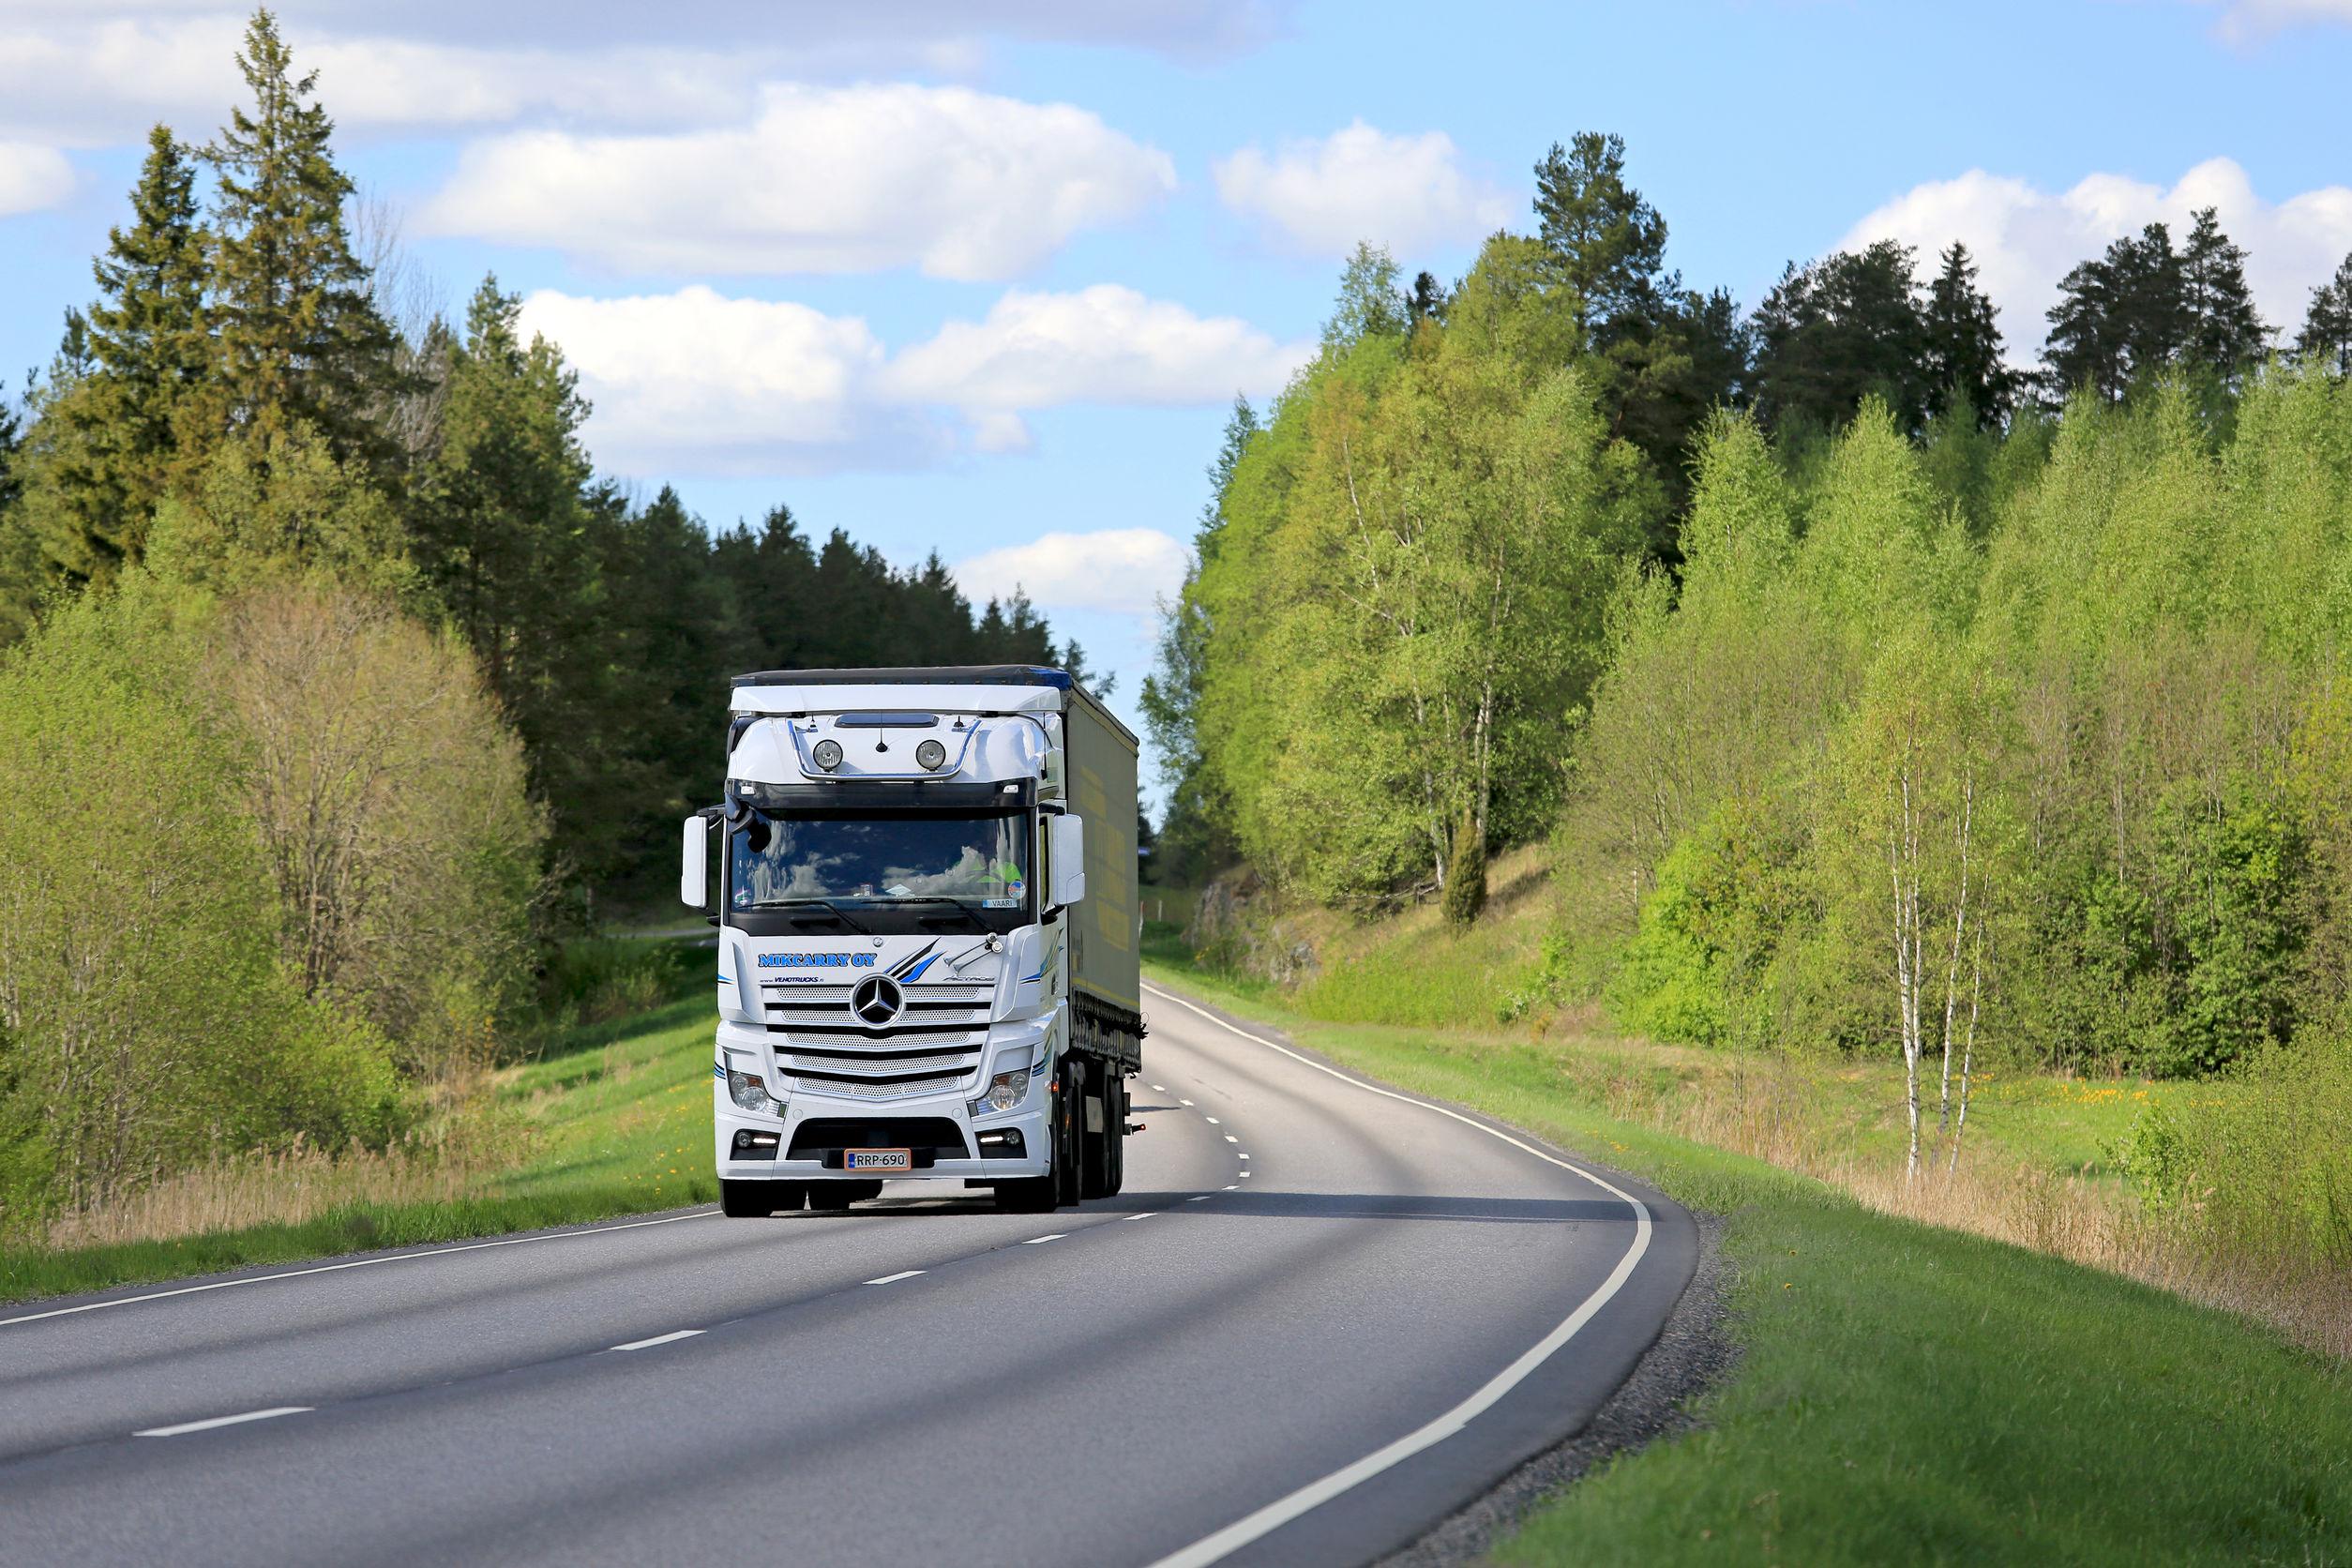 2_kamionut.jpg